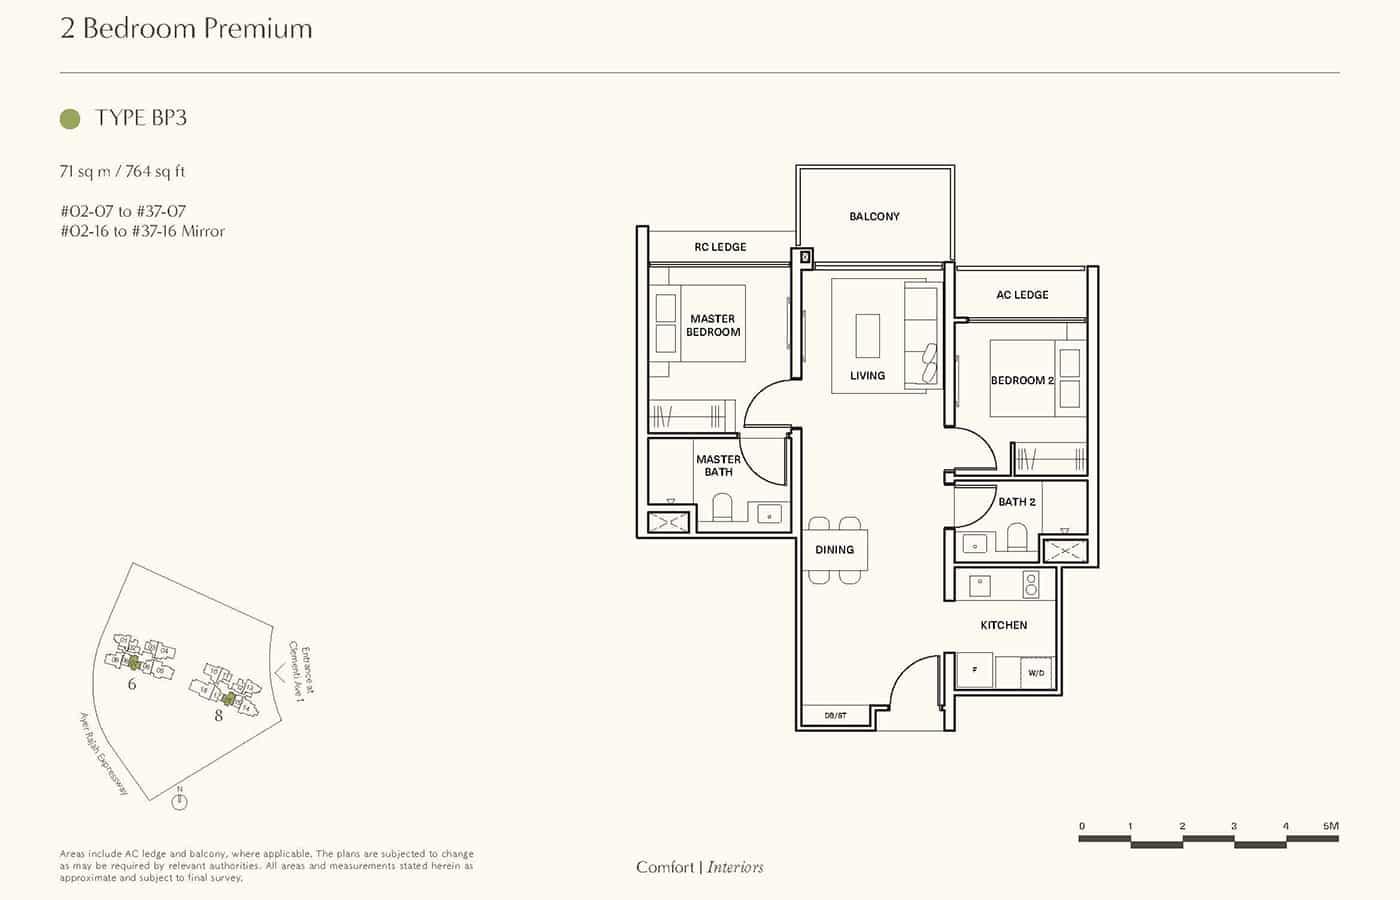 Clavon Condo Floor Plans - 2 Bedroom Premium BP3